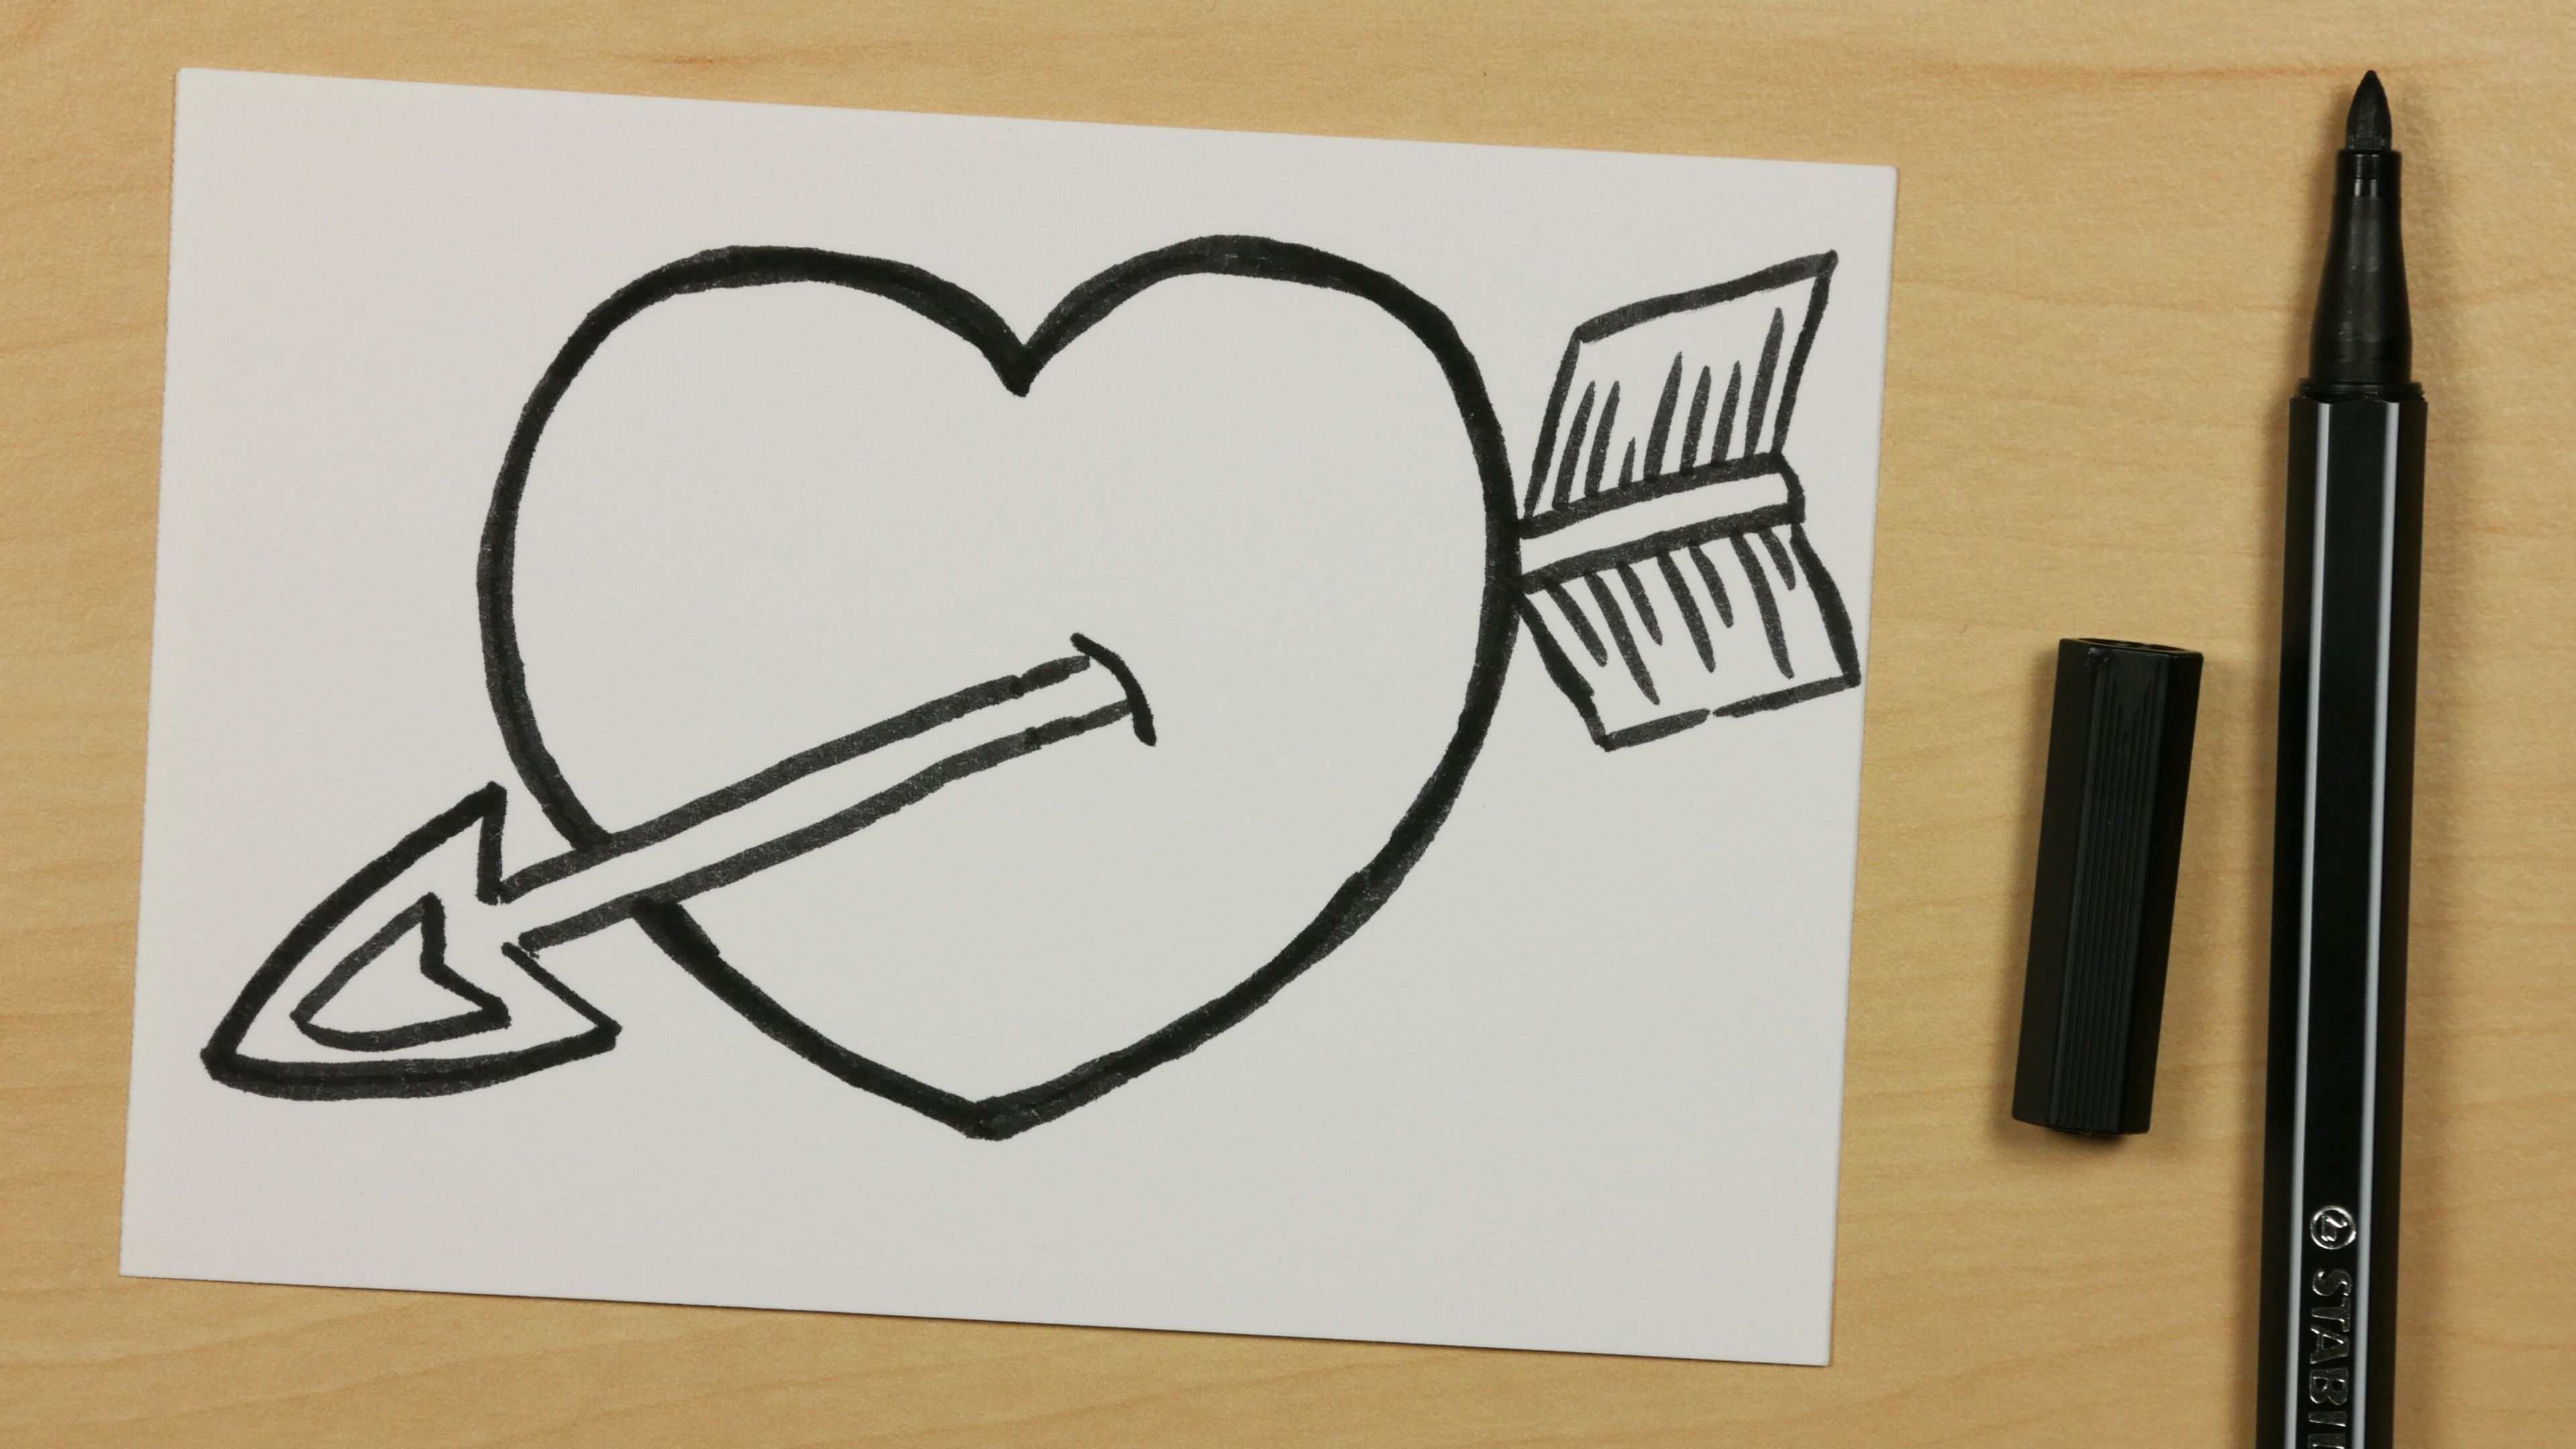 How To Draw A God Cupid Arrow Heart Easy Cartoon Doodle For Kids 118 Https Youtu Be Frrw9a Ncks S Easy Love Drawings Easy Drawings Cute Easy Drawings